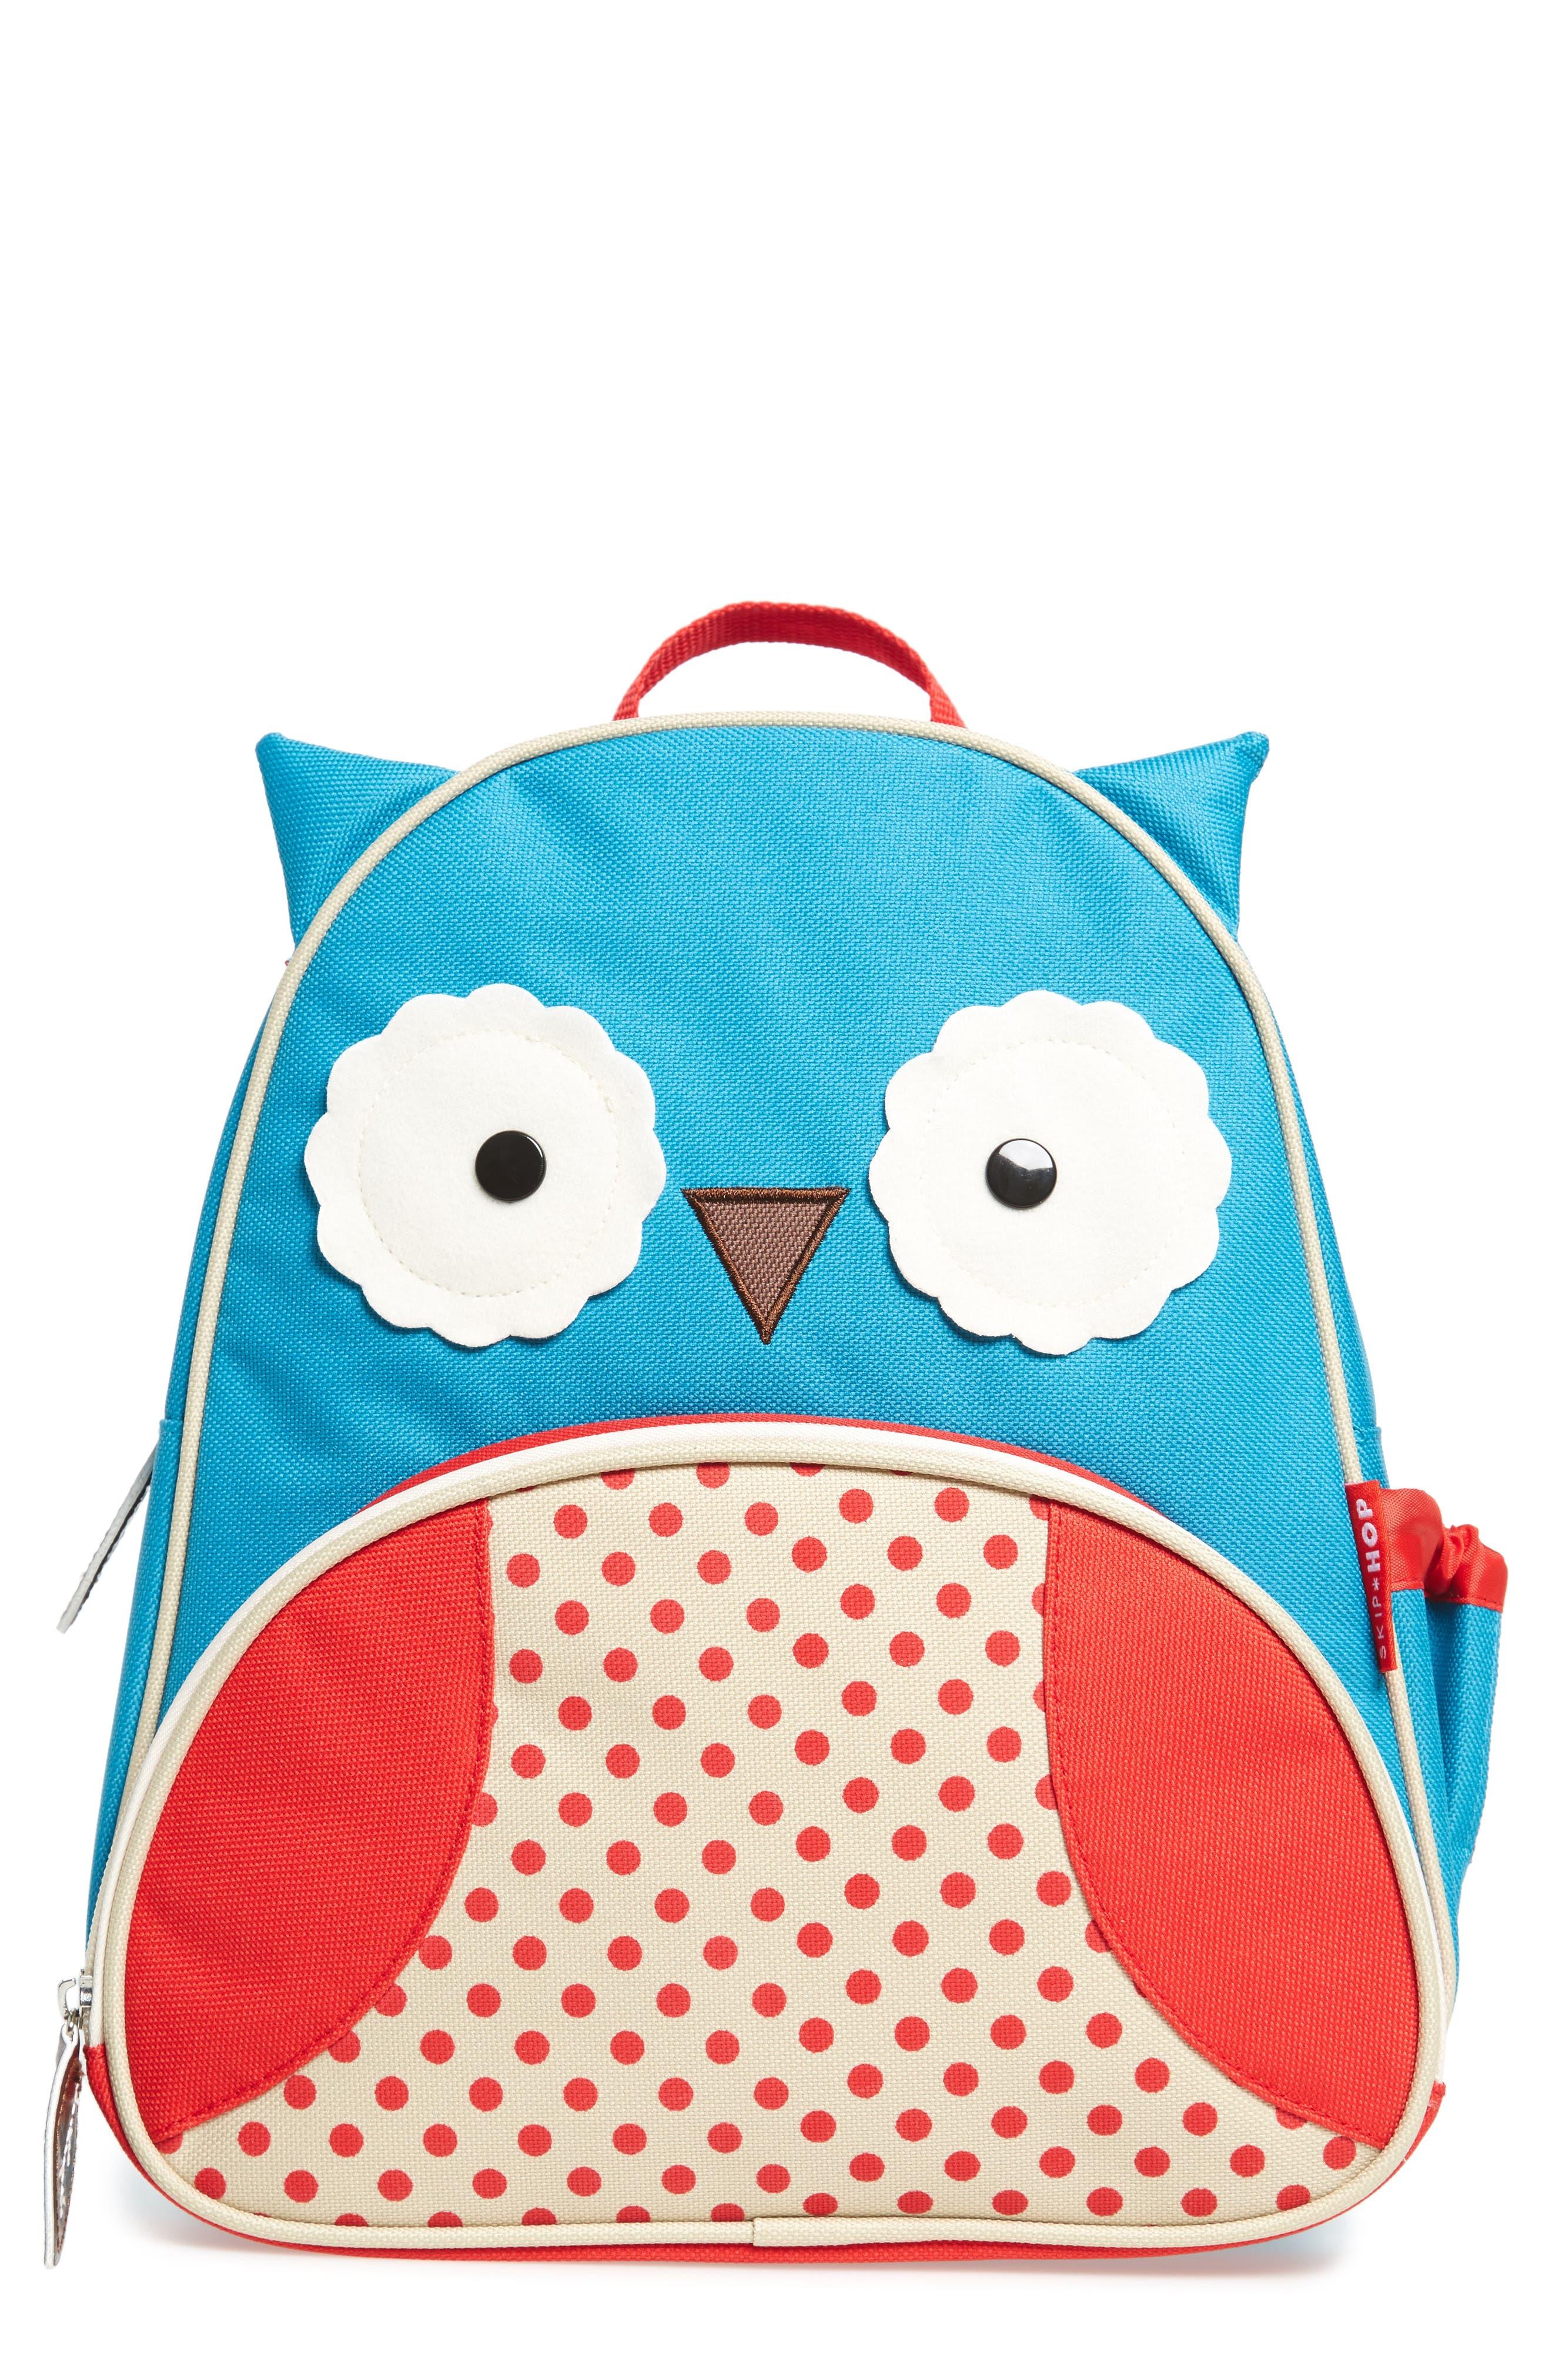 SKIP HOP, Owl Zoo Pack Backpack, Main thumbnail 1, color, BLUE MULTI